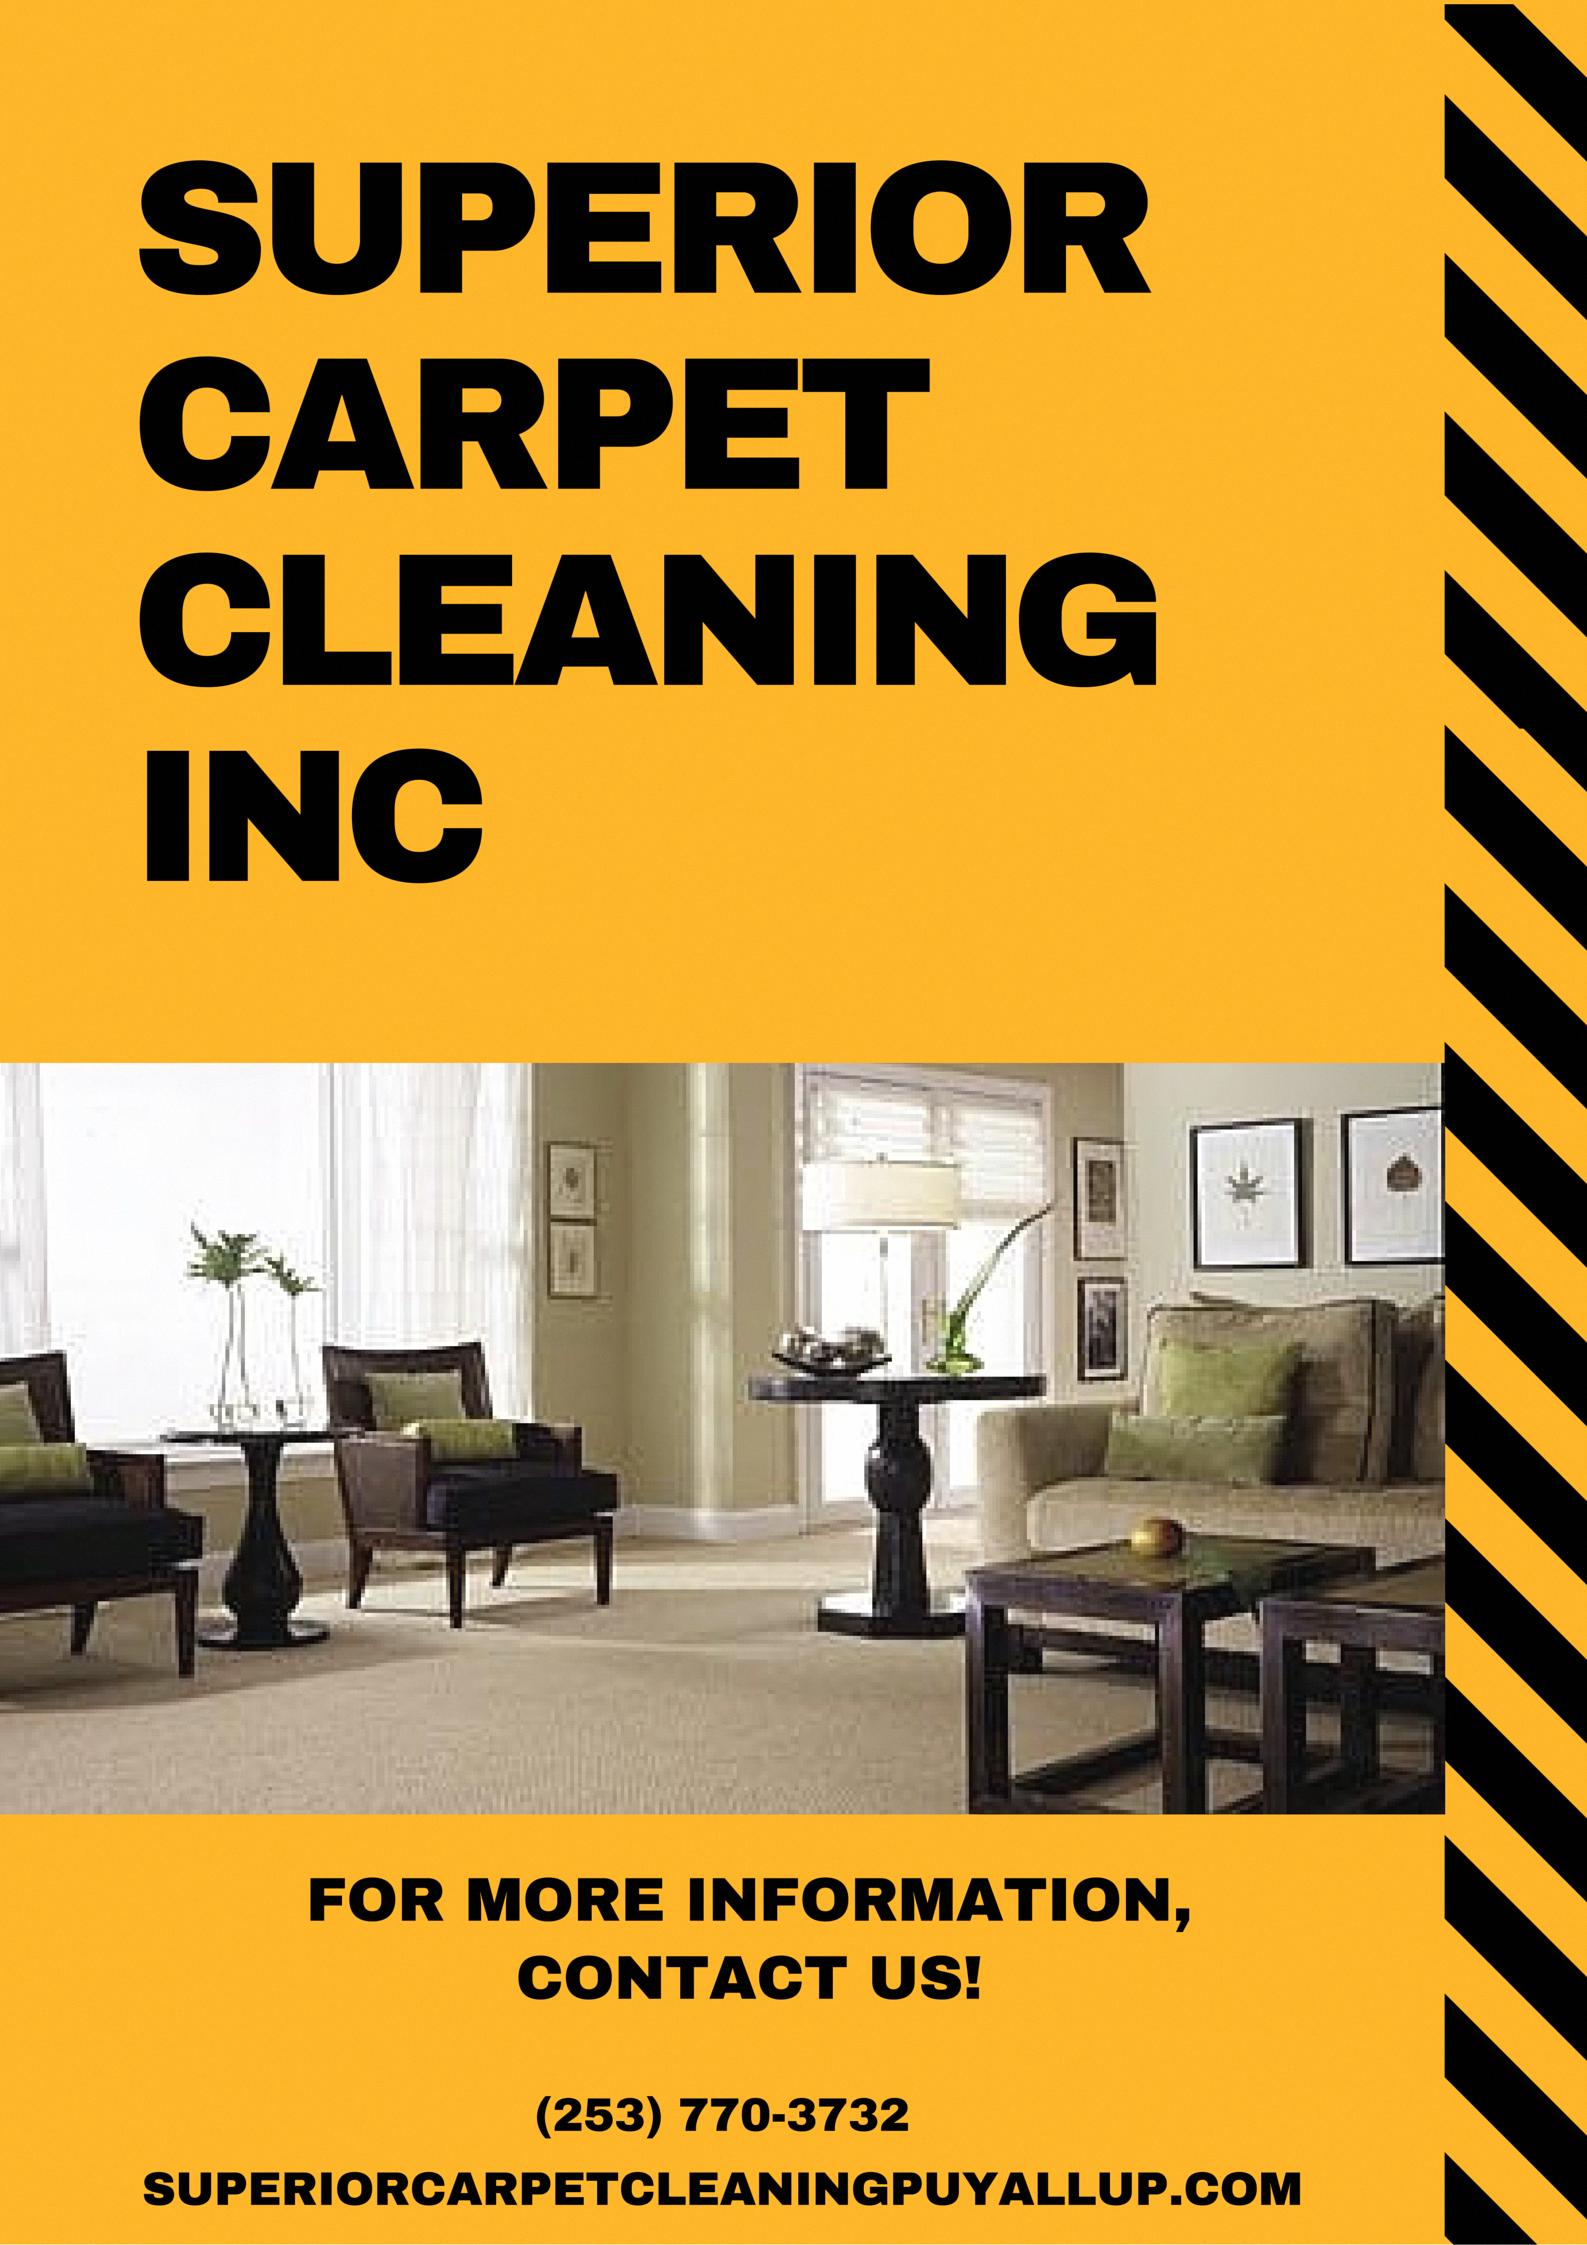 4RunnerCarpetFloorMats CarpetsAtMenards Affordable